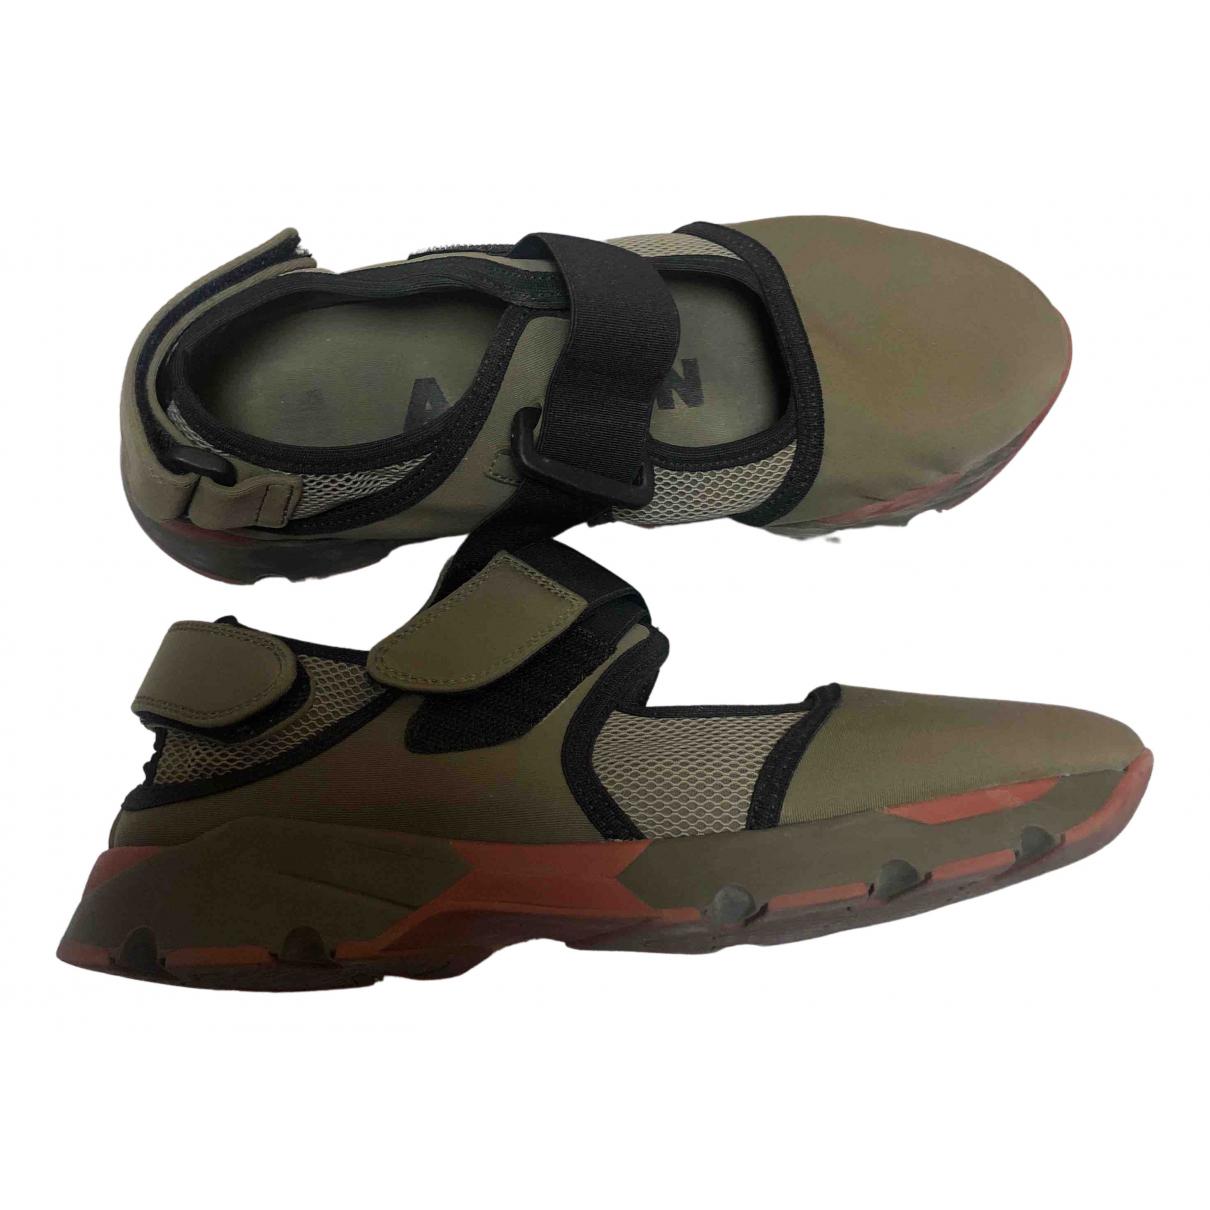 Marni \N Sneakers in  Gruen Polyester